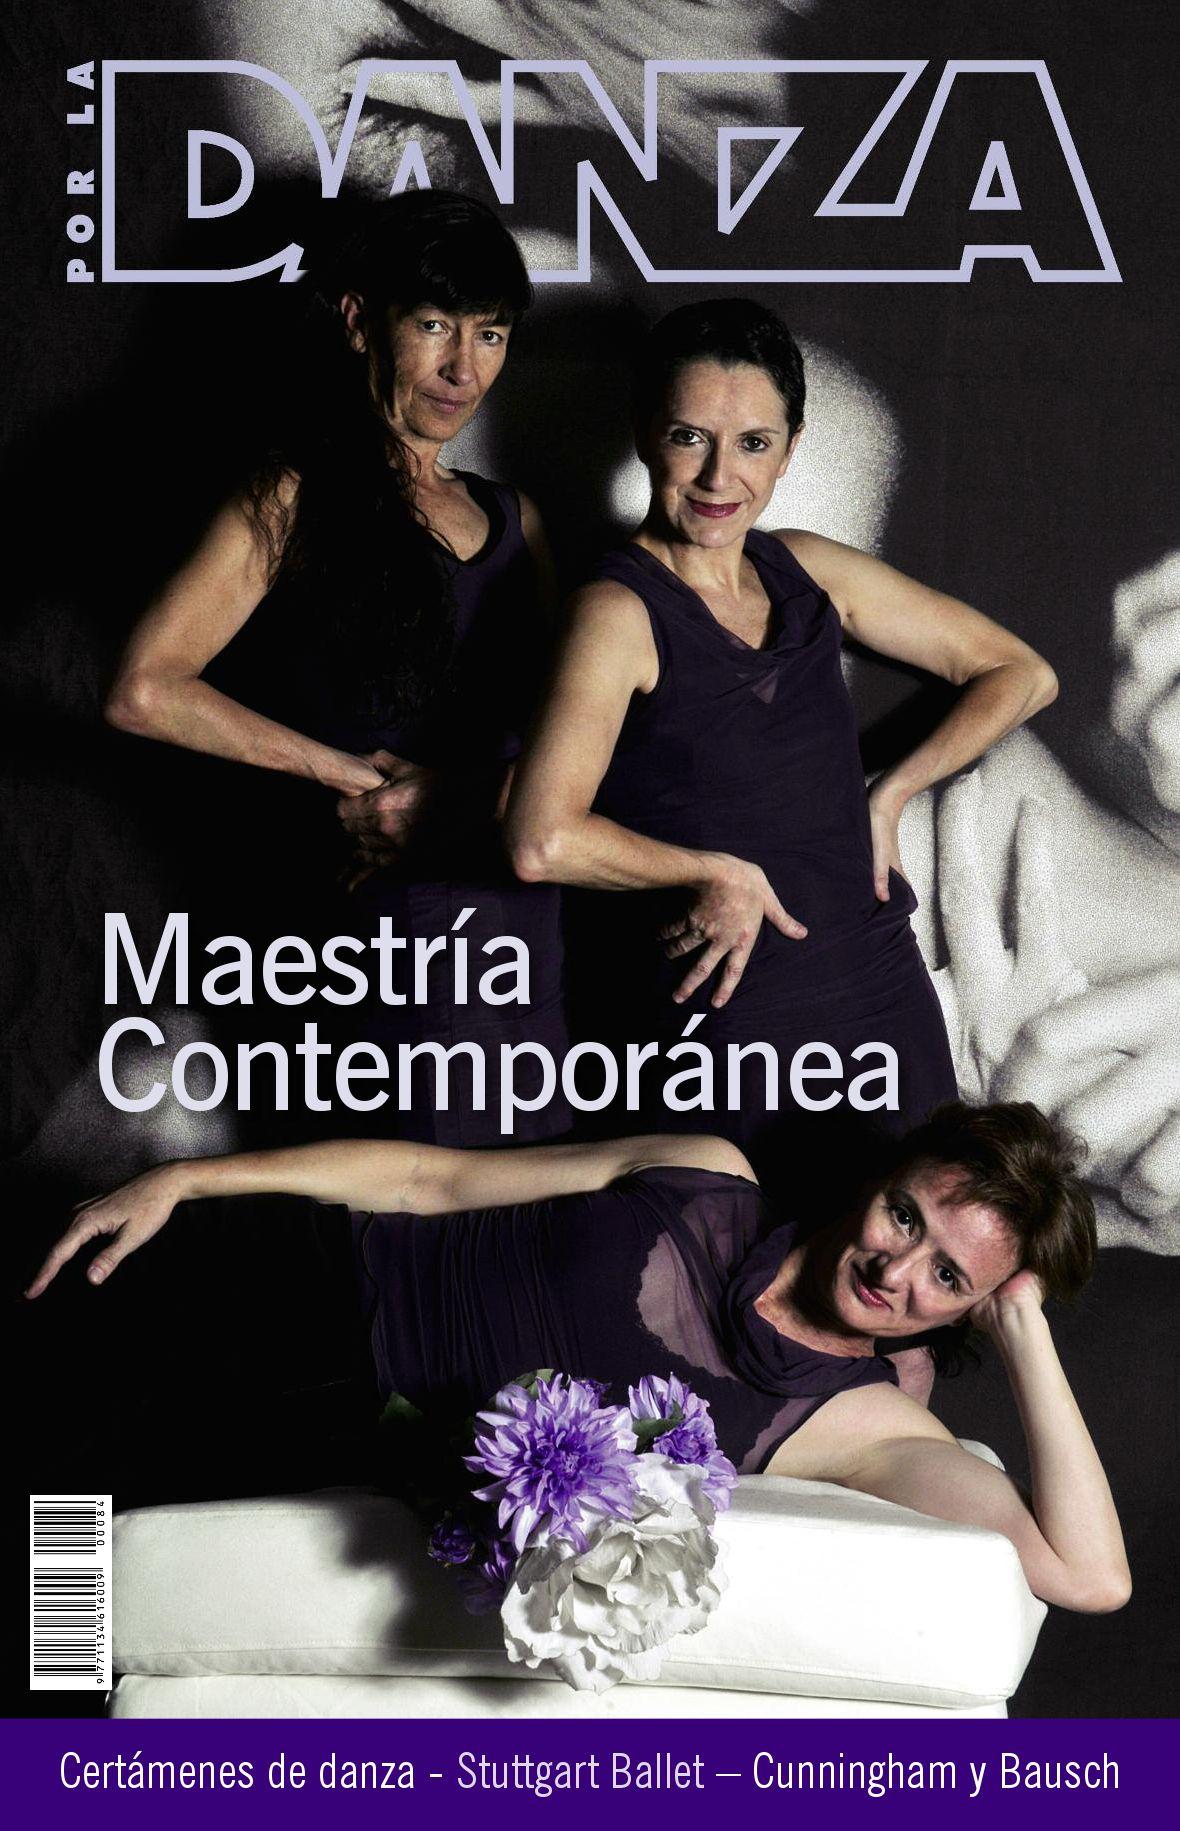 POR LA DANZA 84 by Revista Por la danza - issuu